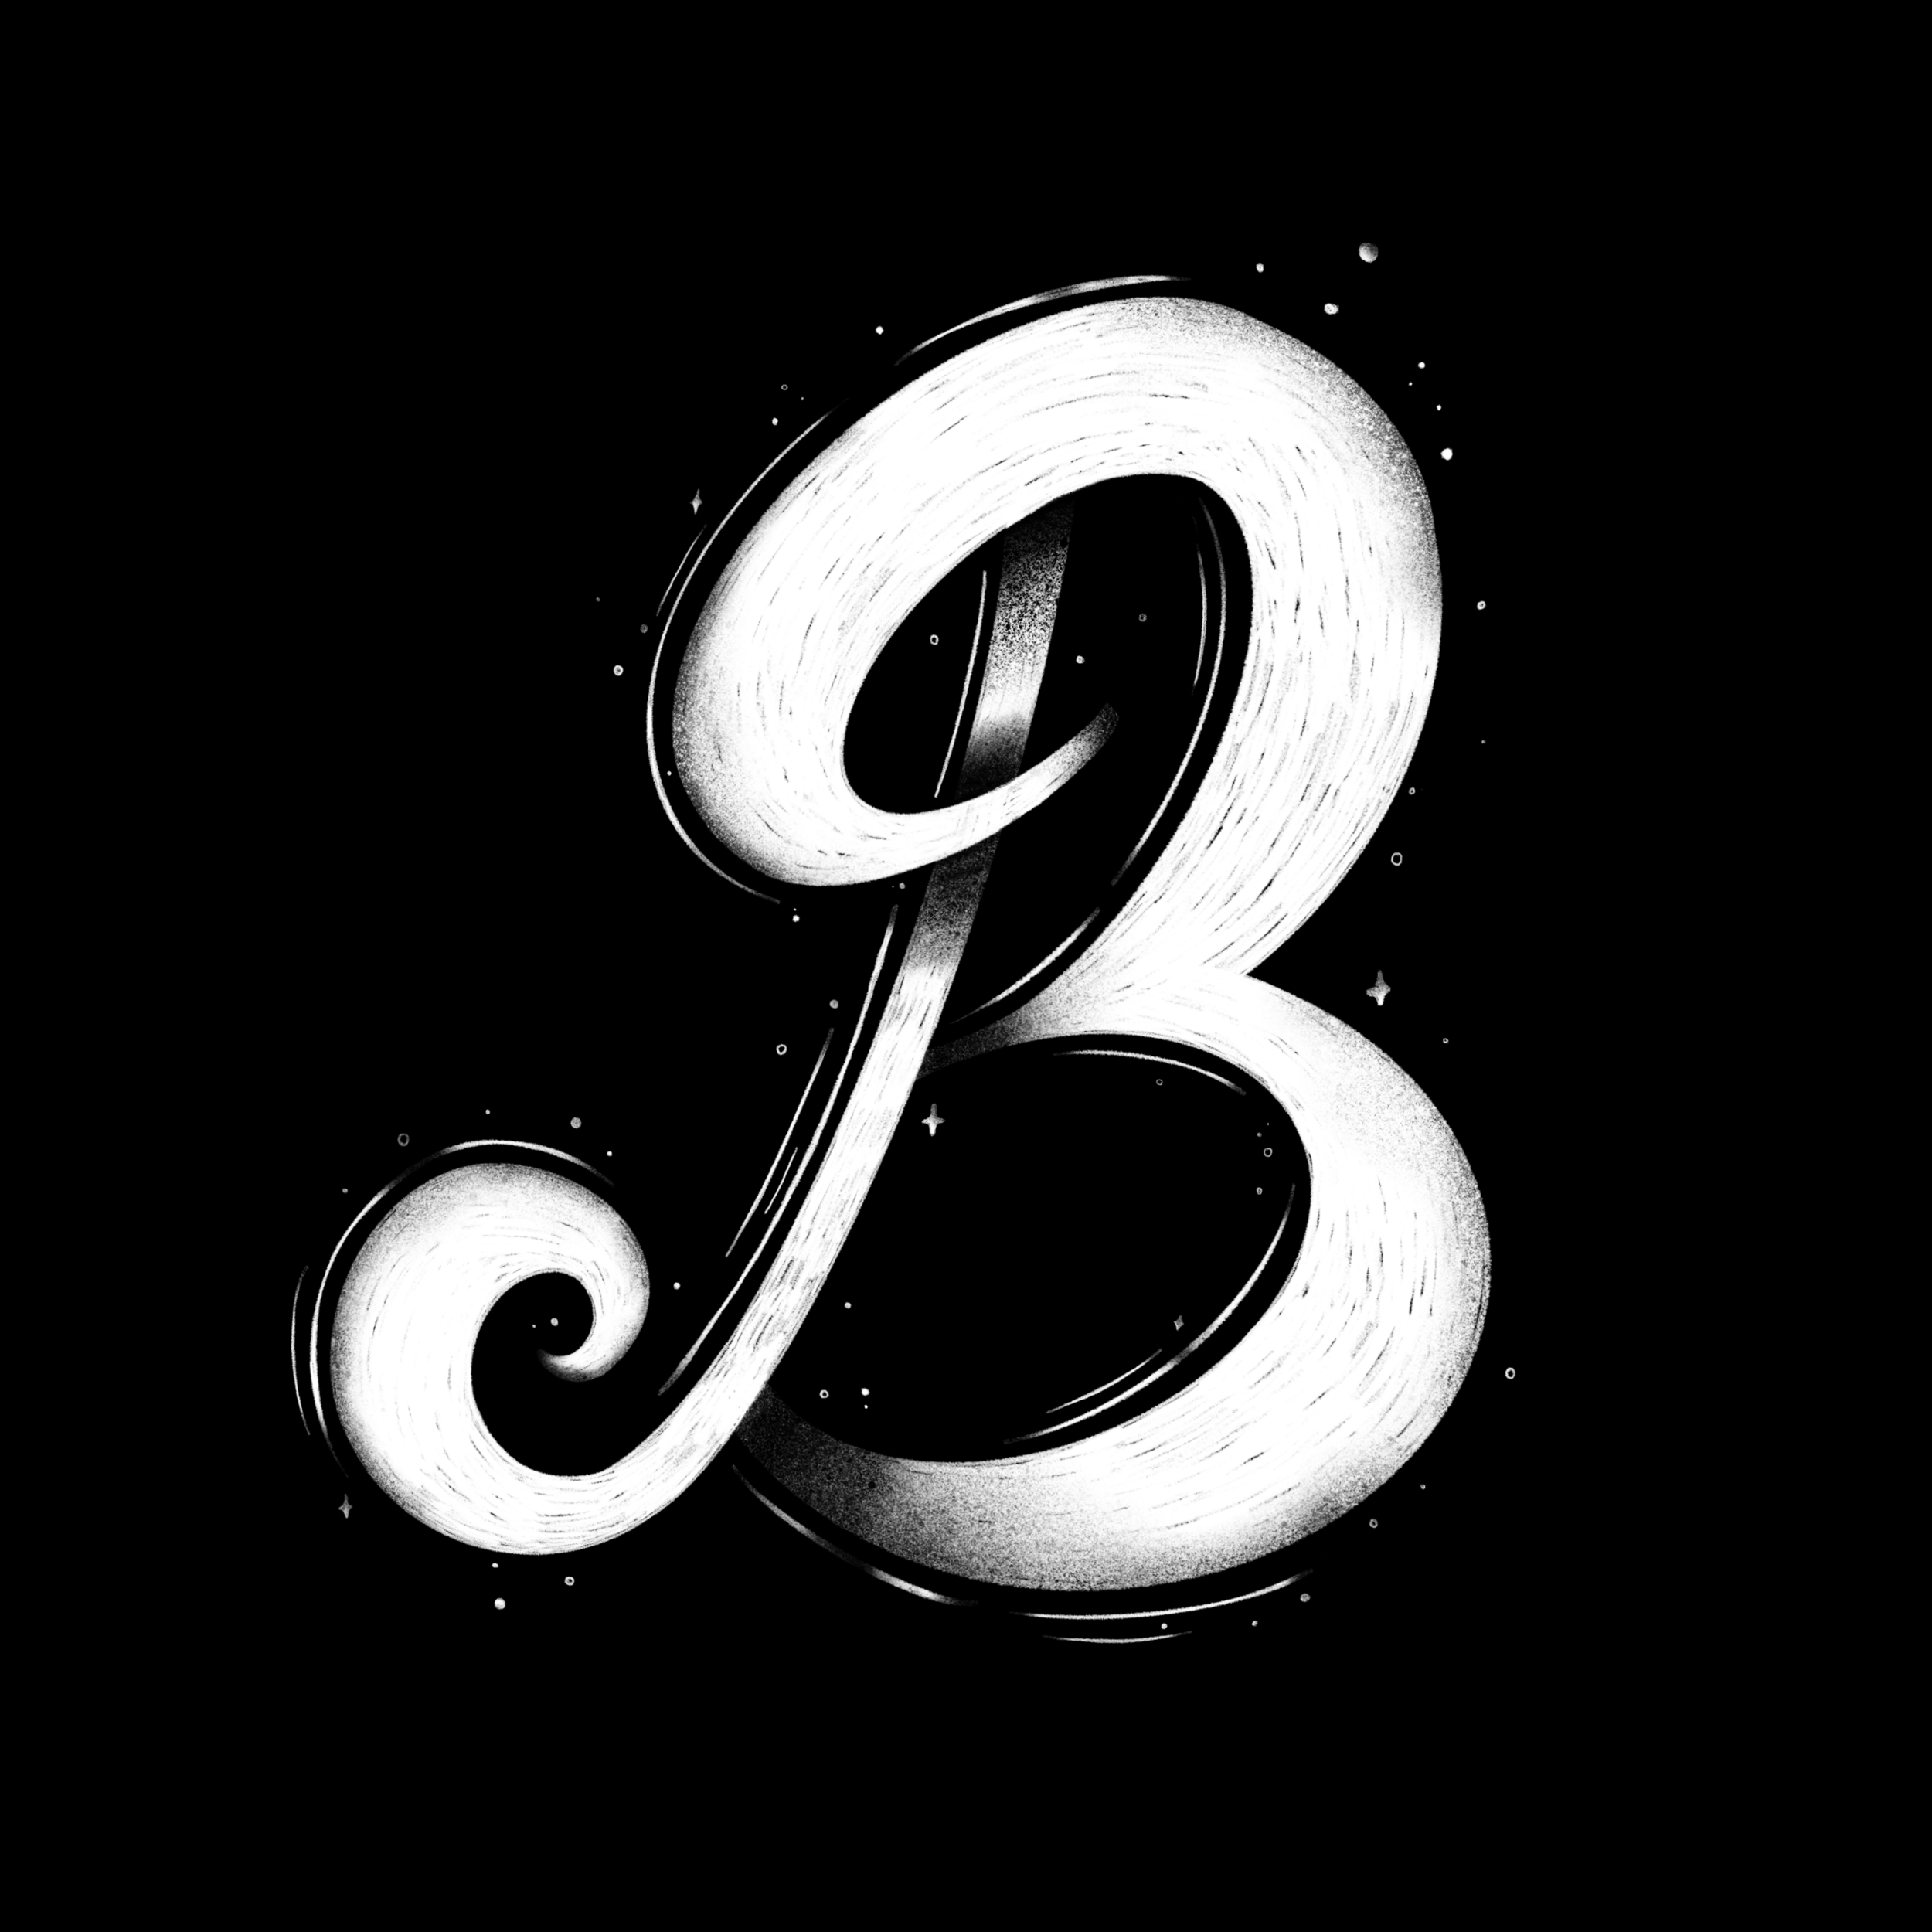 36days_b.png